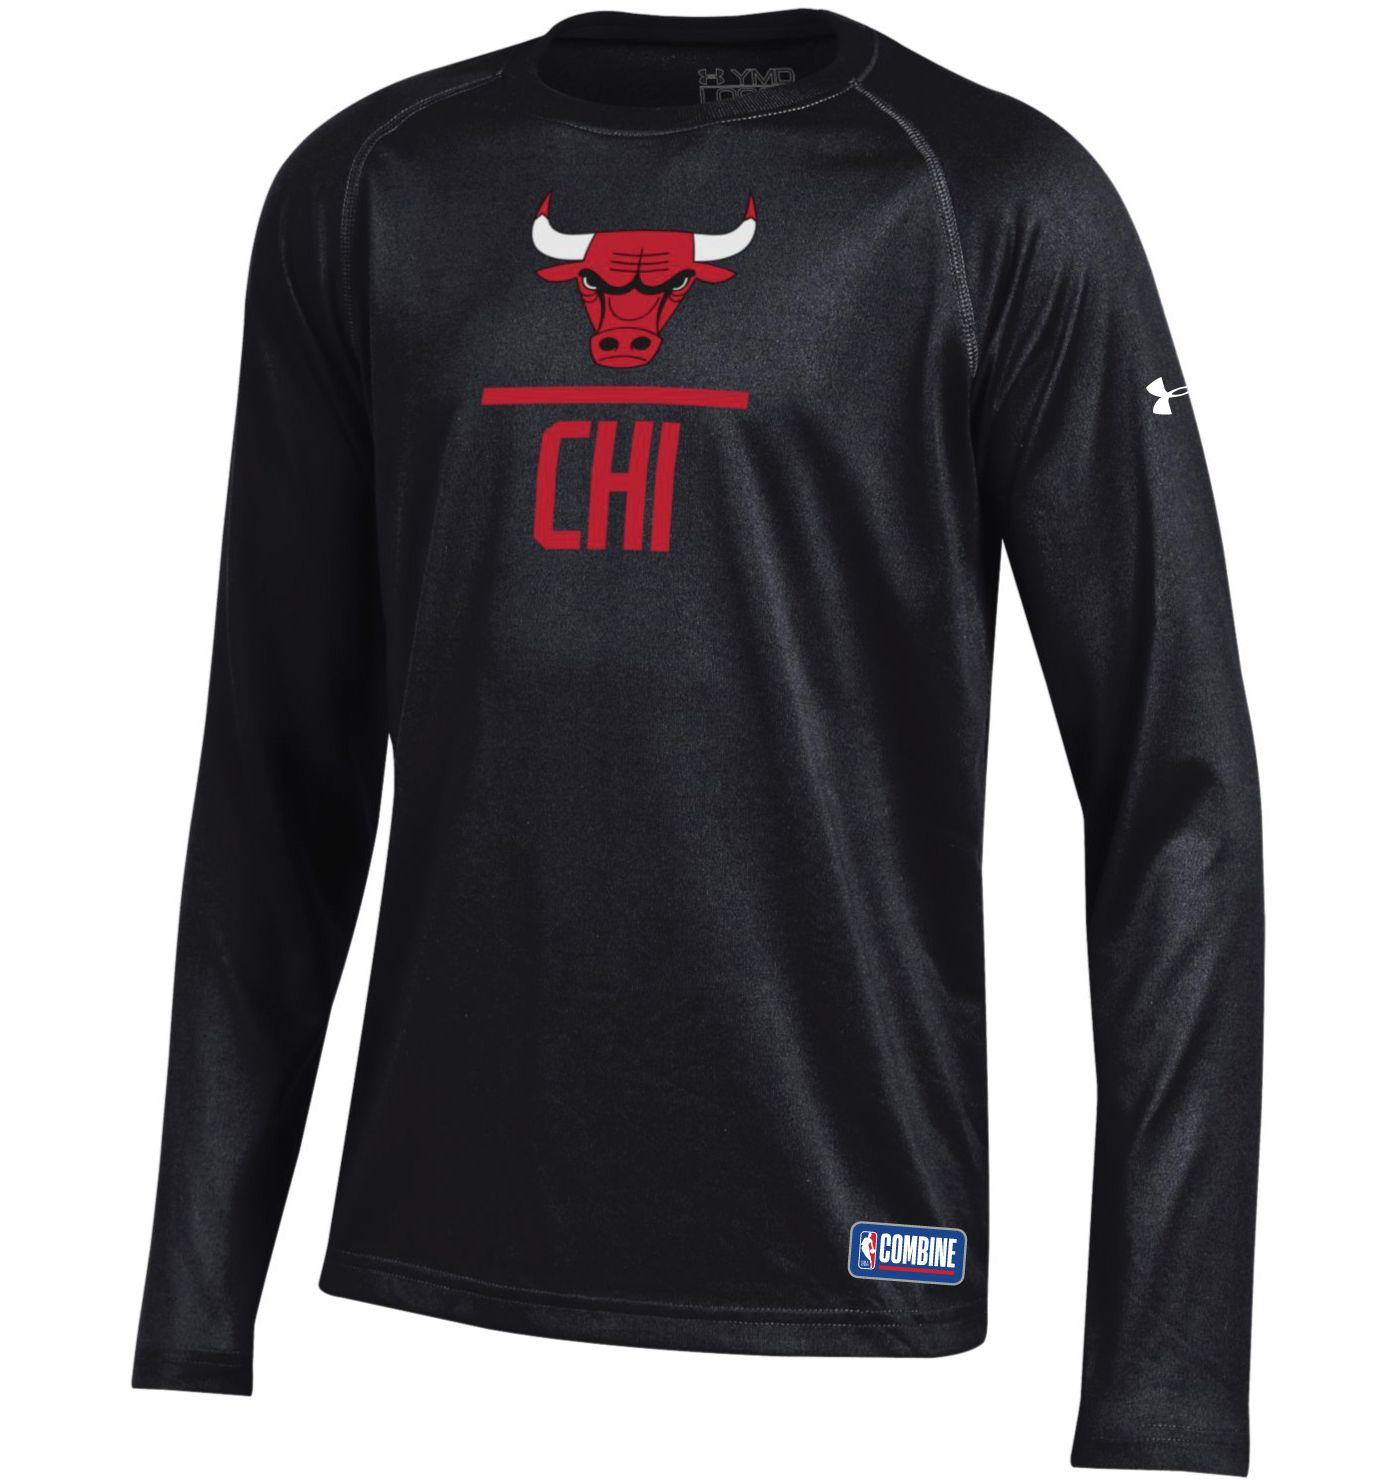 Under Armour Youth Chicago Bulls Lockup Long Sleeve Shirt